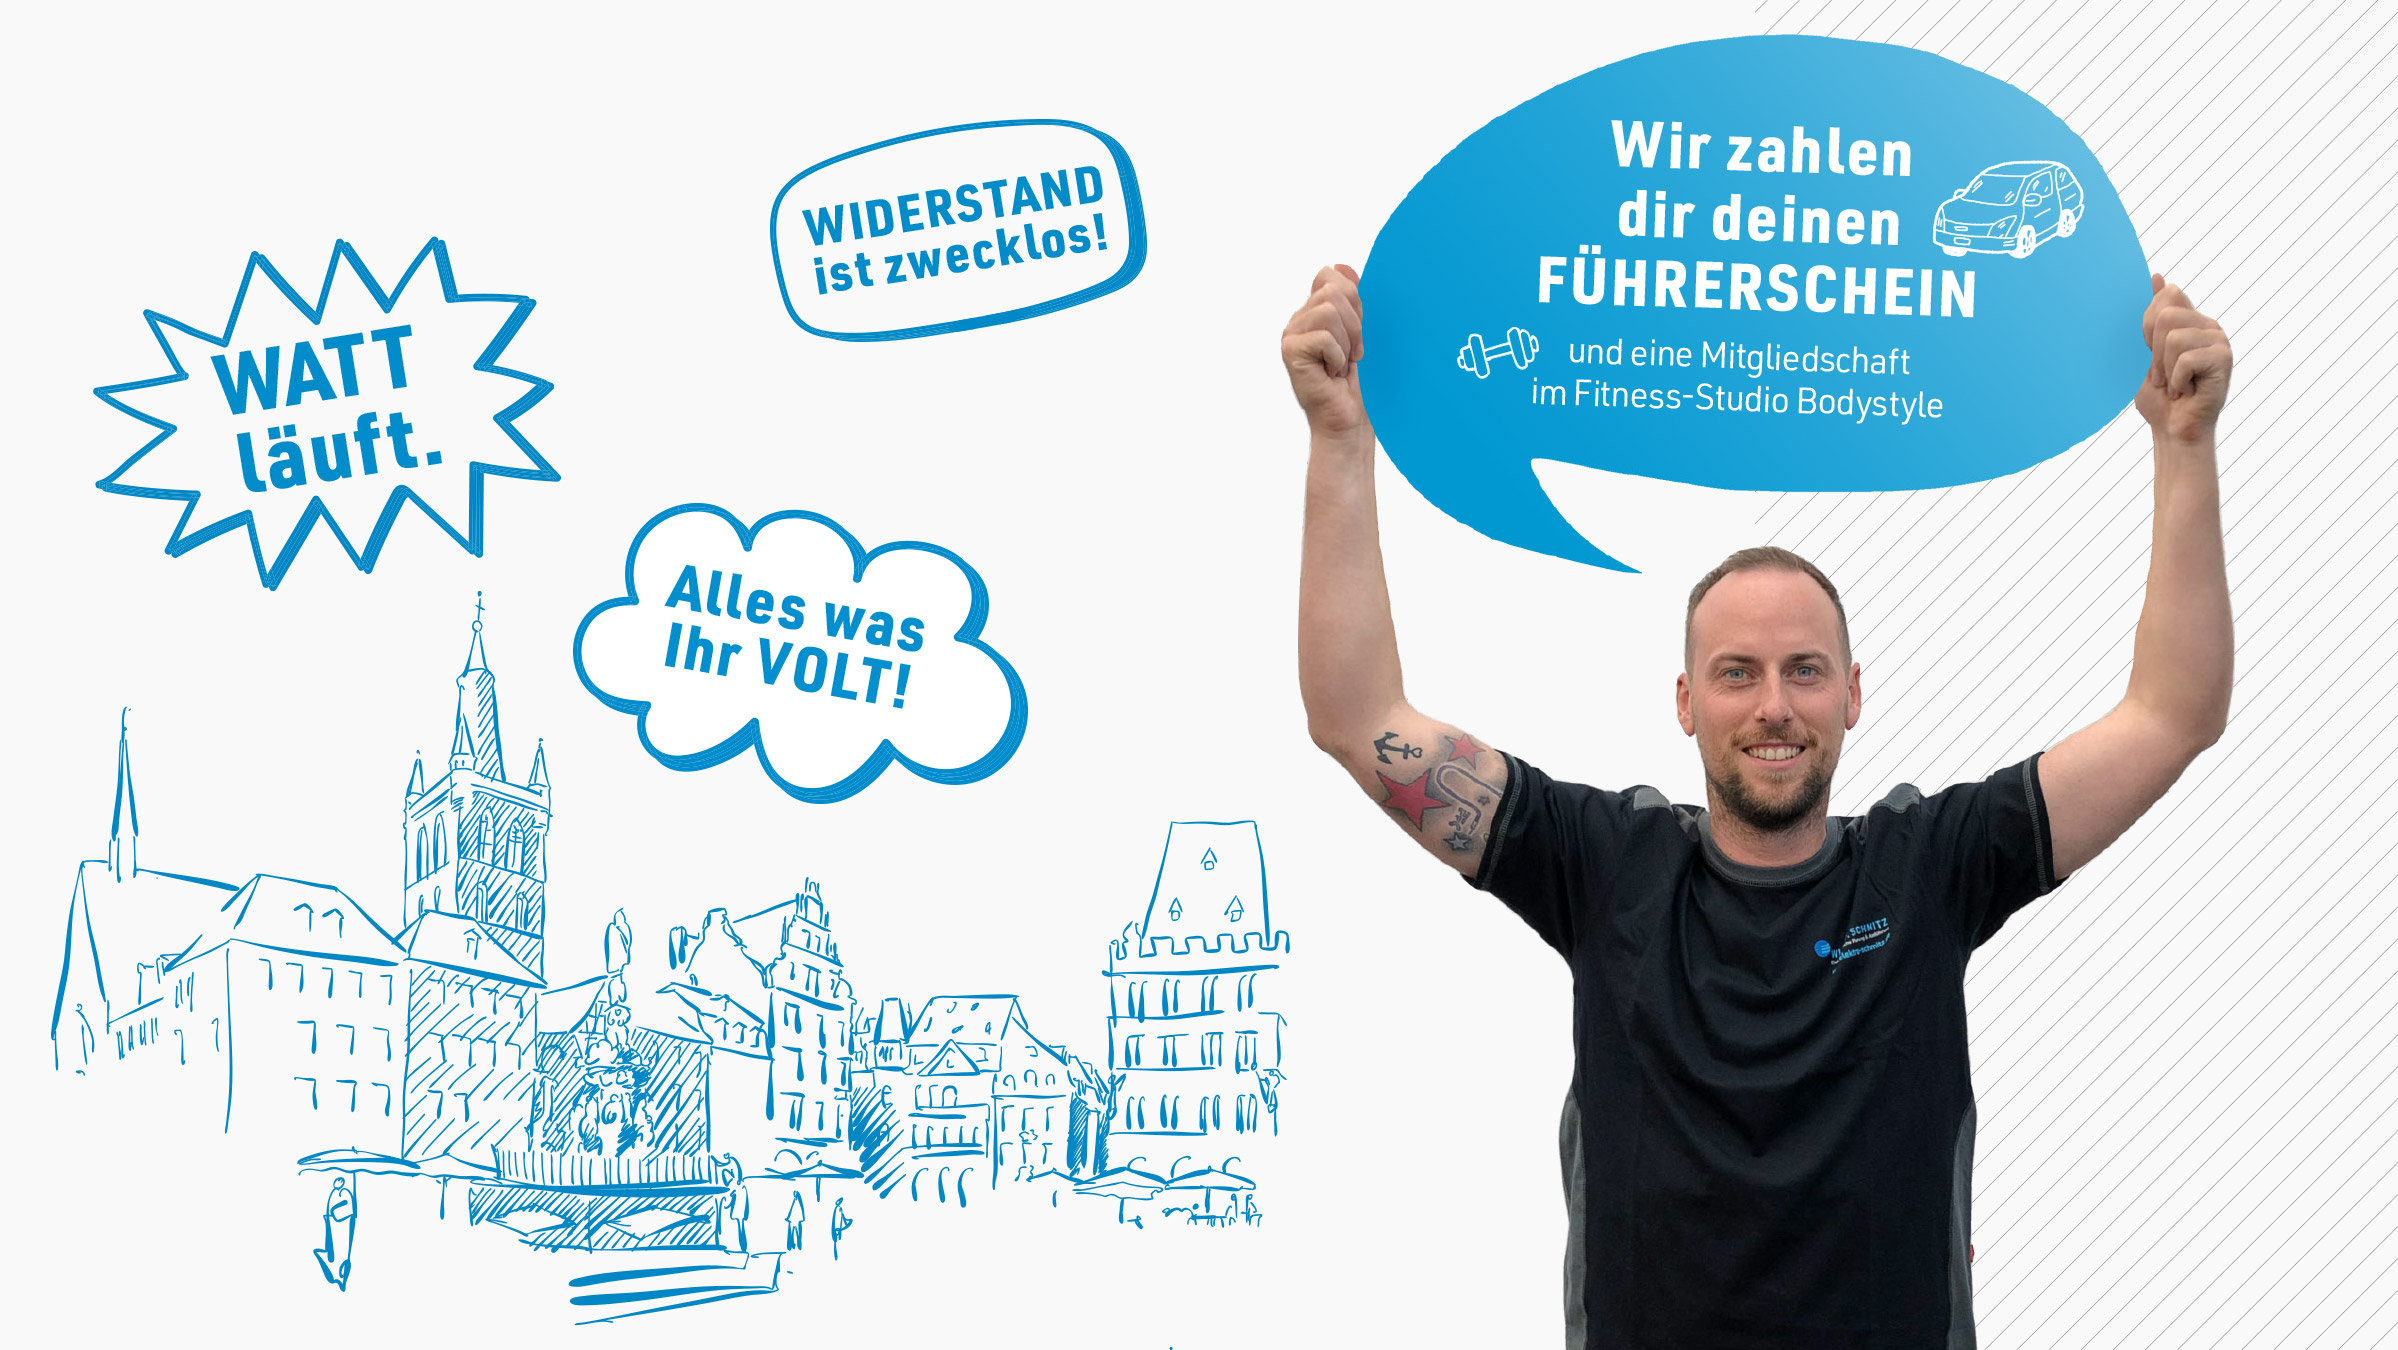 https://elektro-schmitz.de/wp-content/uploads/2019/09/Jobs_Ausbildung.jpg